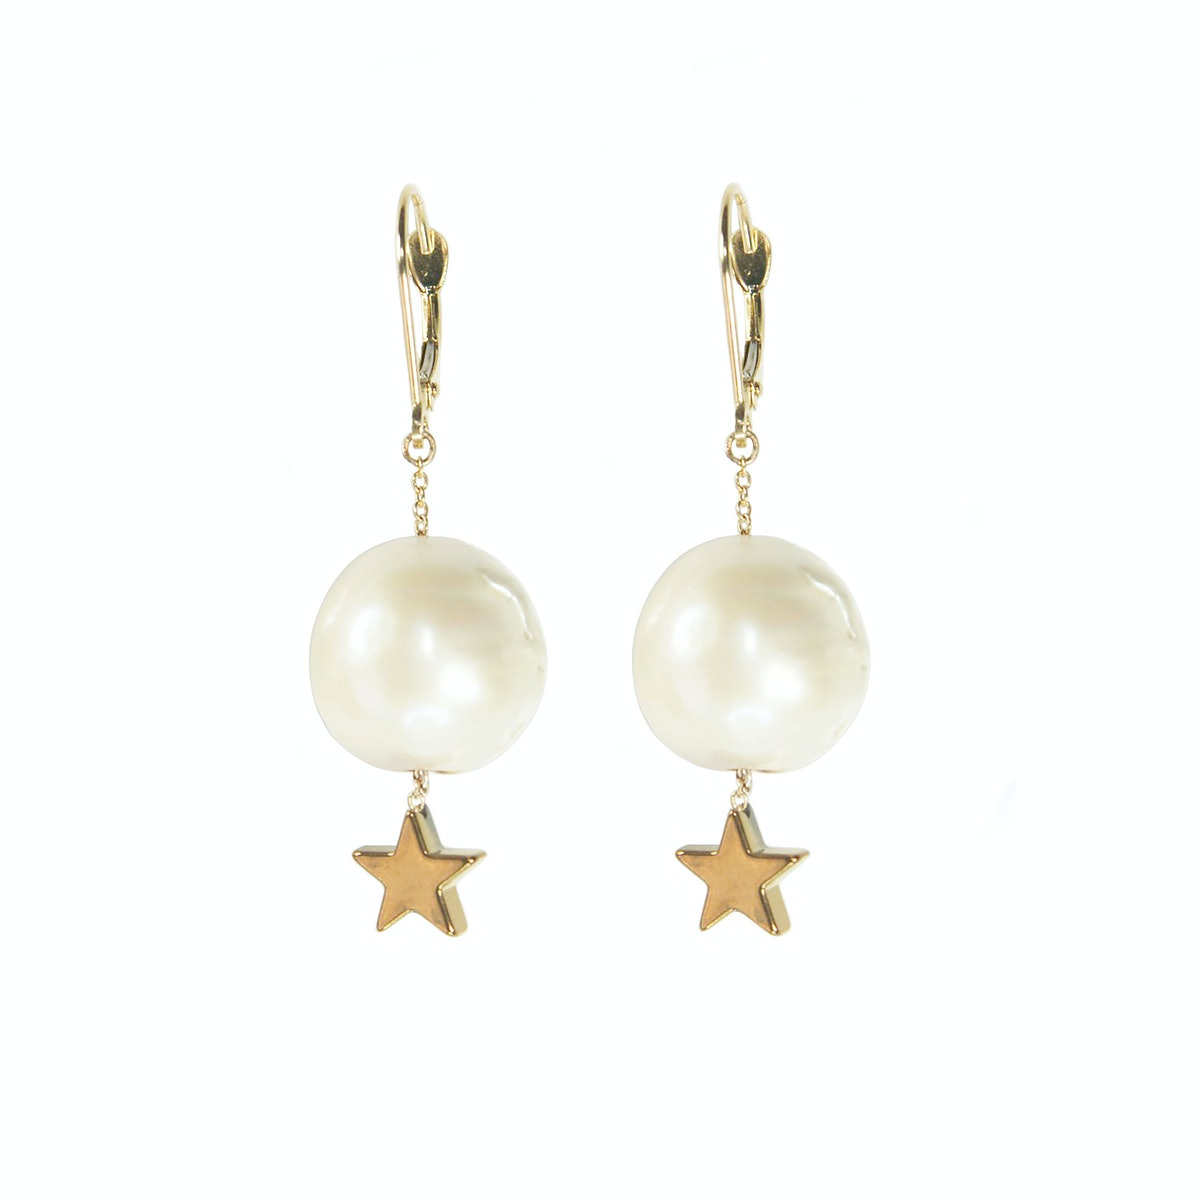 McKenzie Liautaud 18k gold and freshwater pearl earrings